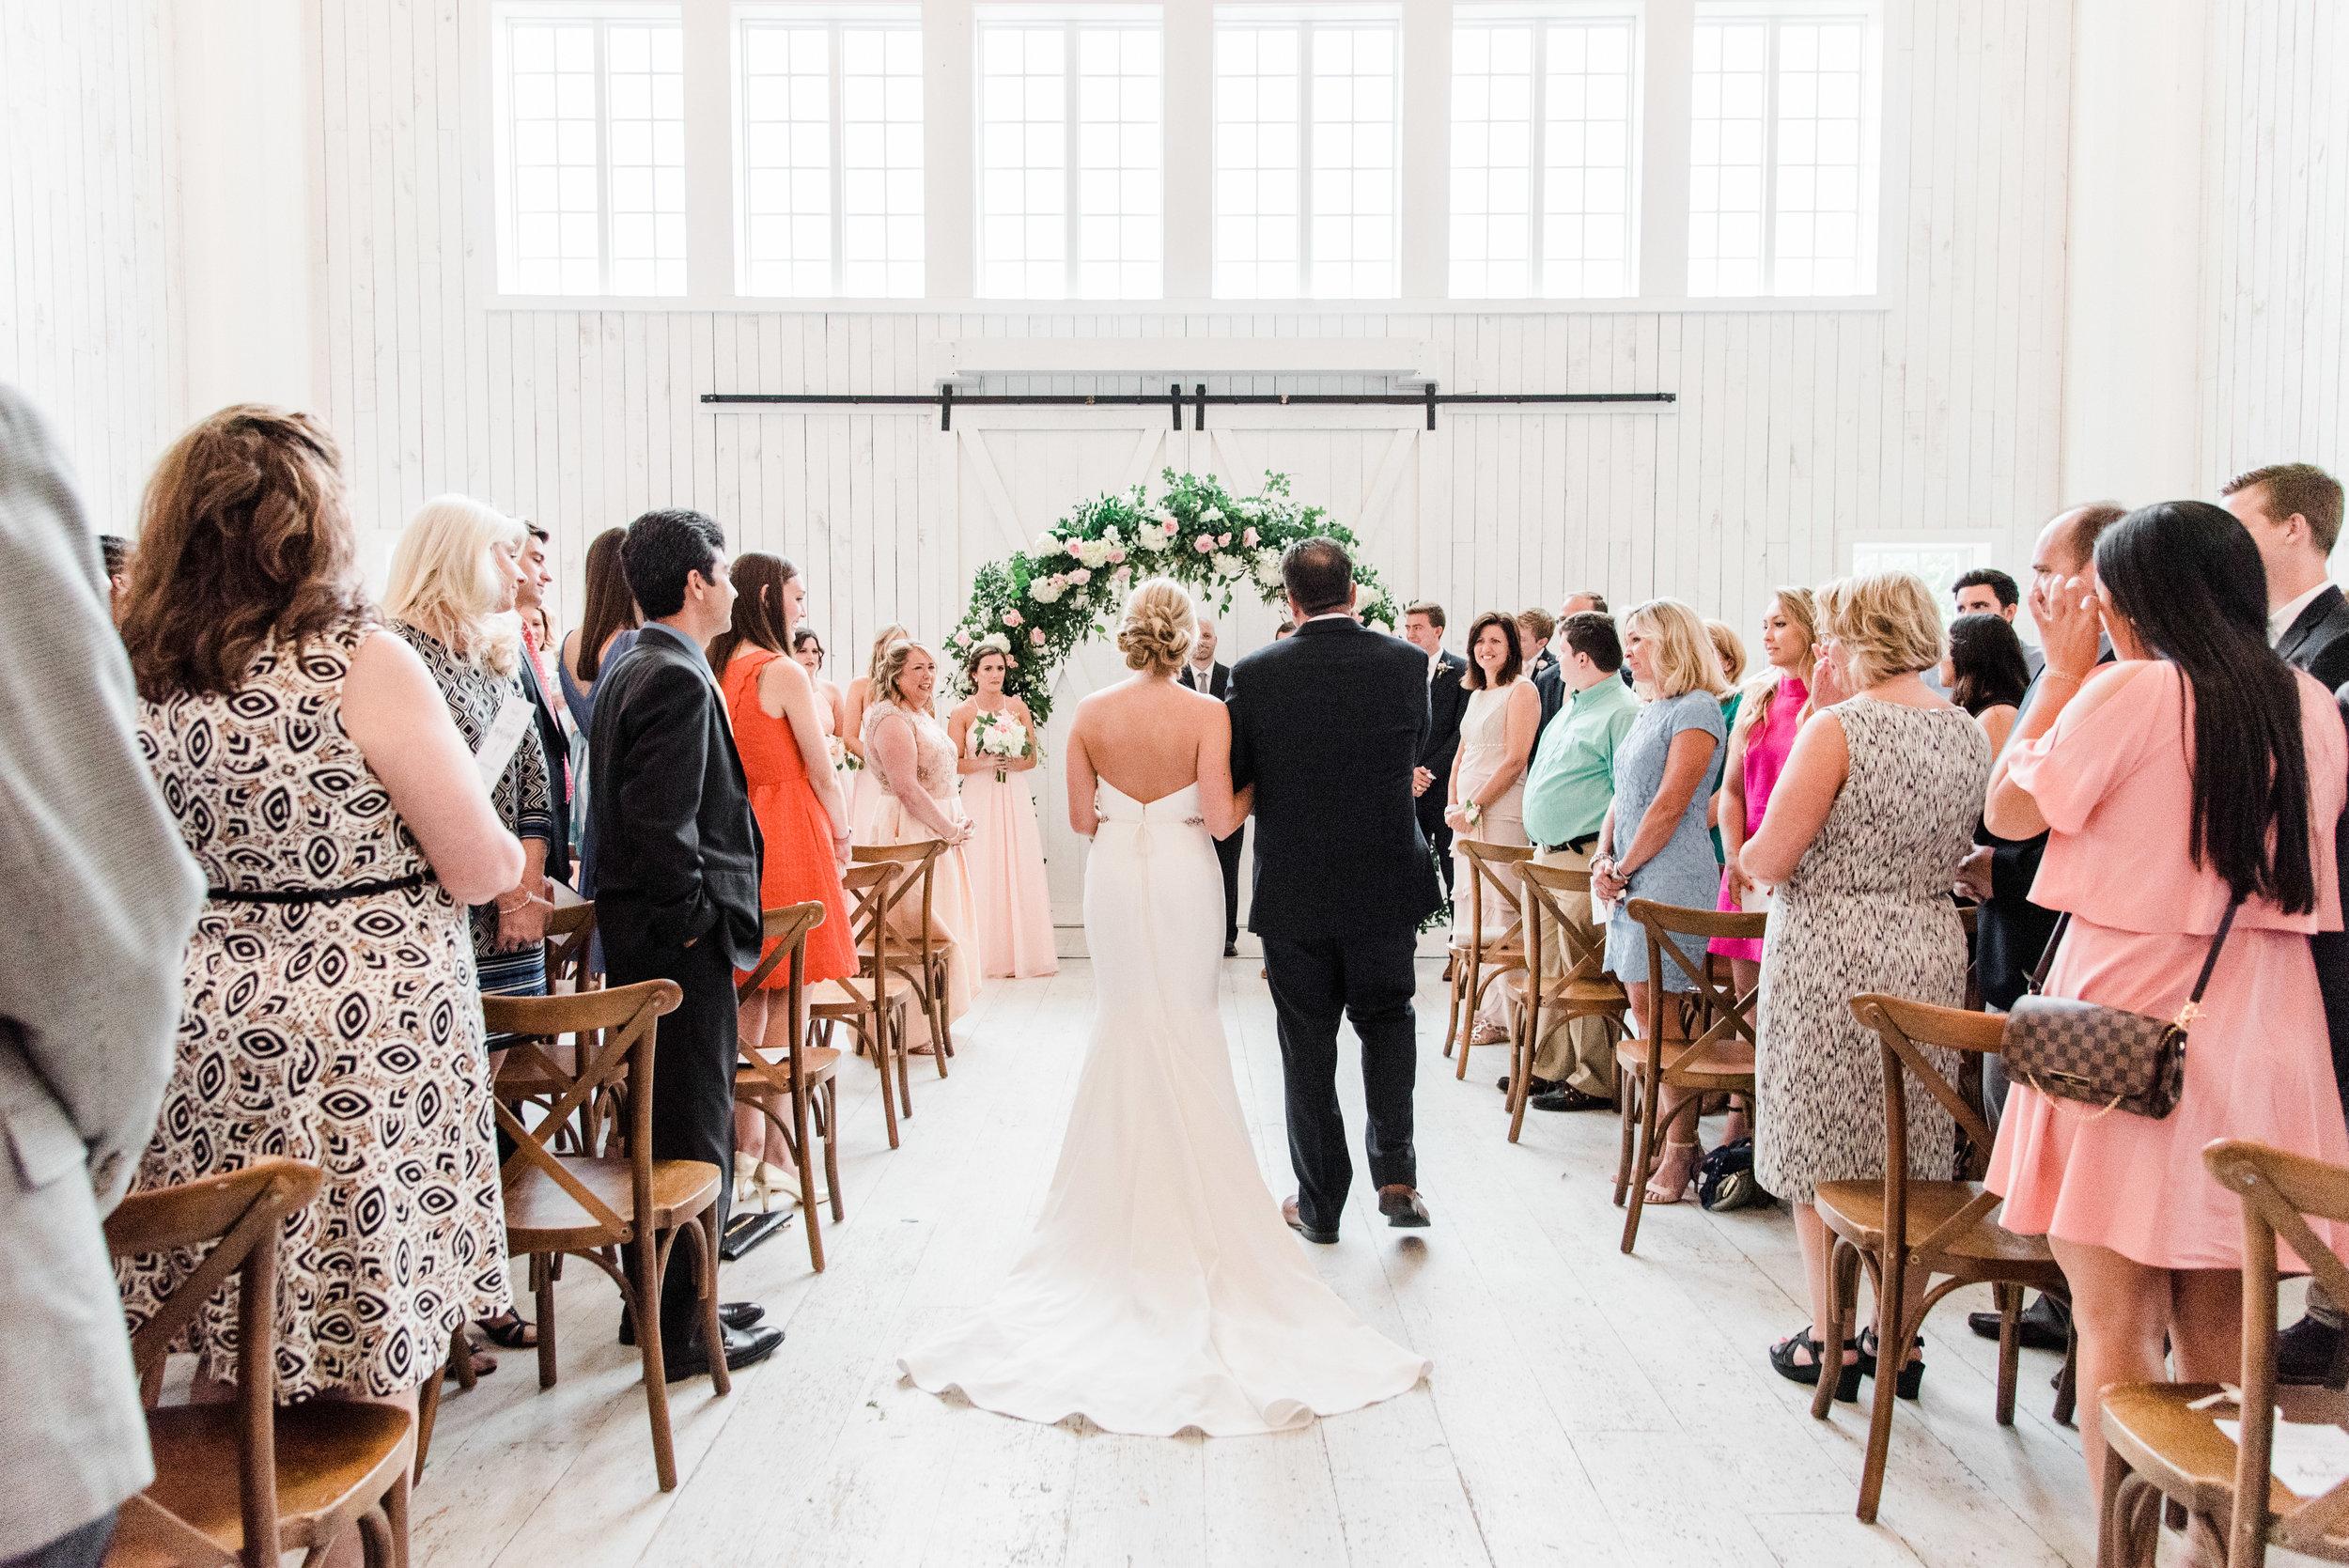 gray-door-photography-wedding-portraits-dallas-photographer-steph-erffmeyer10.jpg